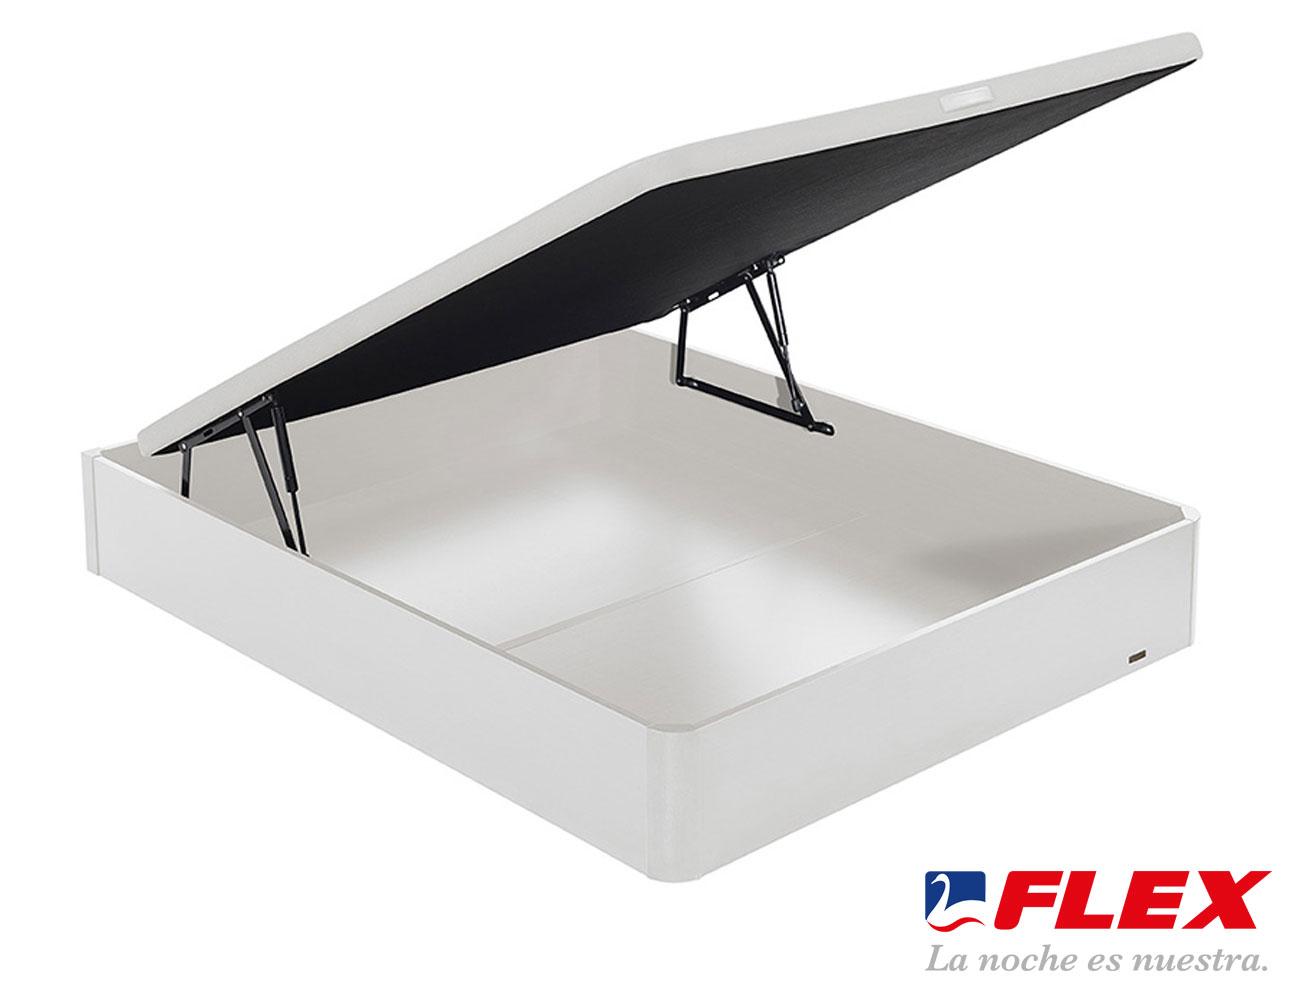 Canape flex abatible blanco 1